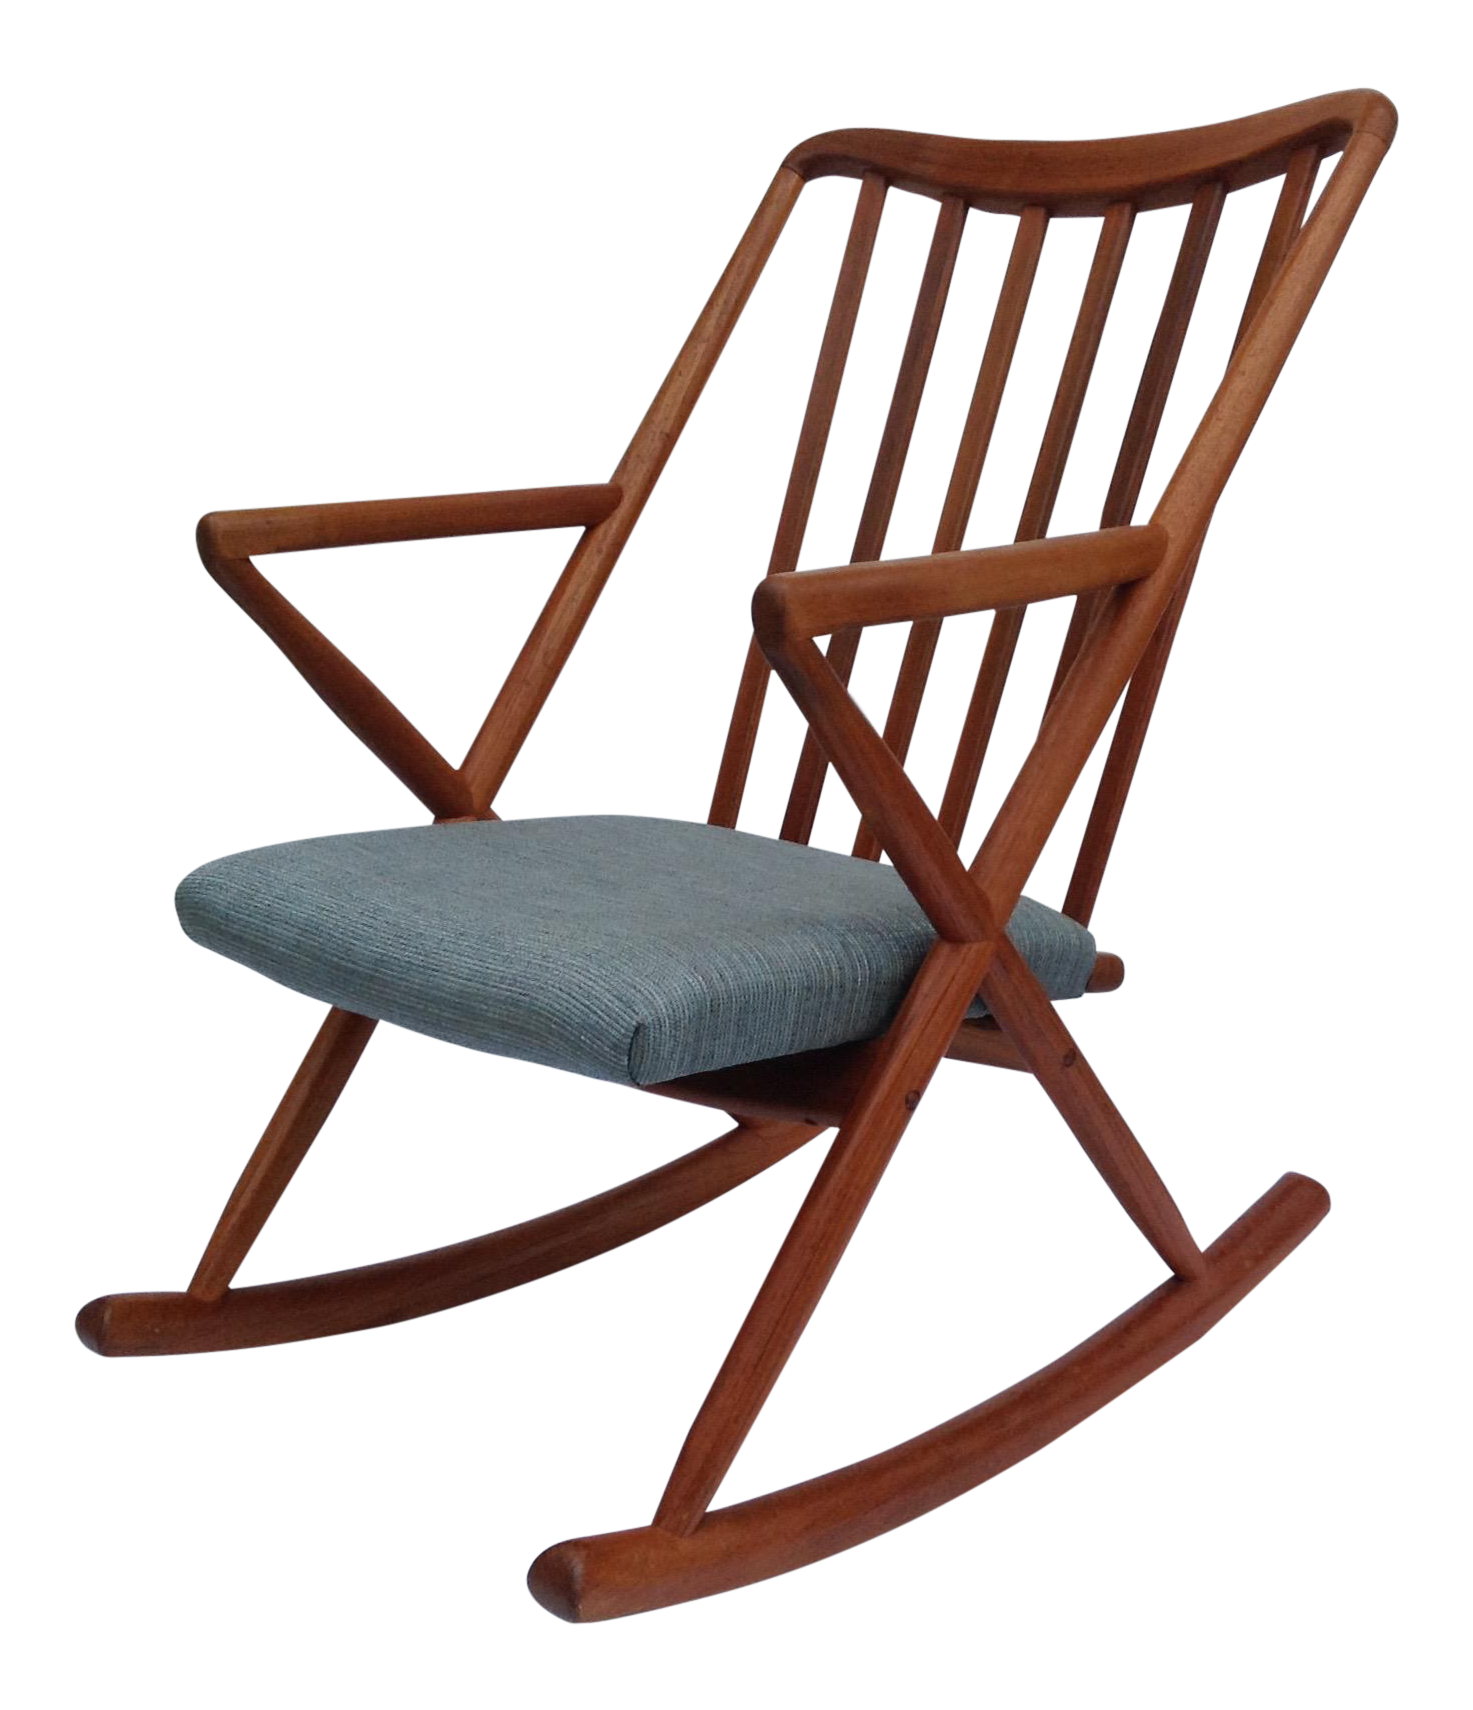 Benny Linden Danish Mid Century Teak Rocking Chair